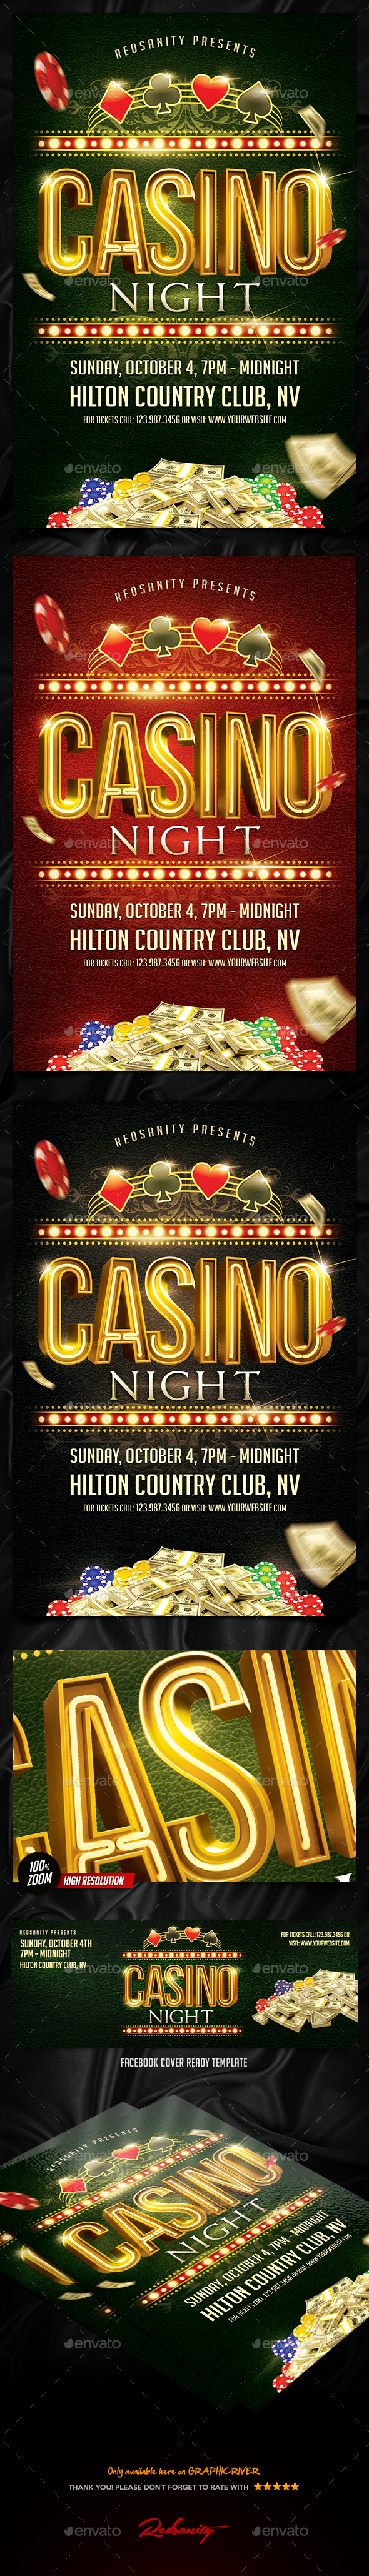 Casino Night Flyer Plus FB Cover